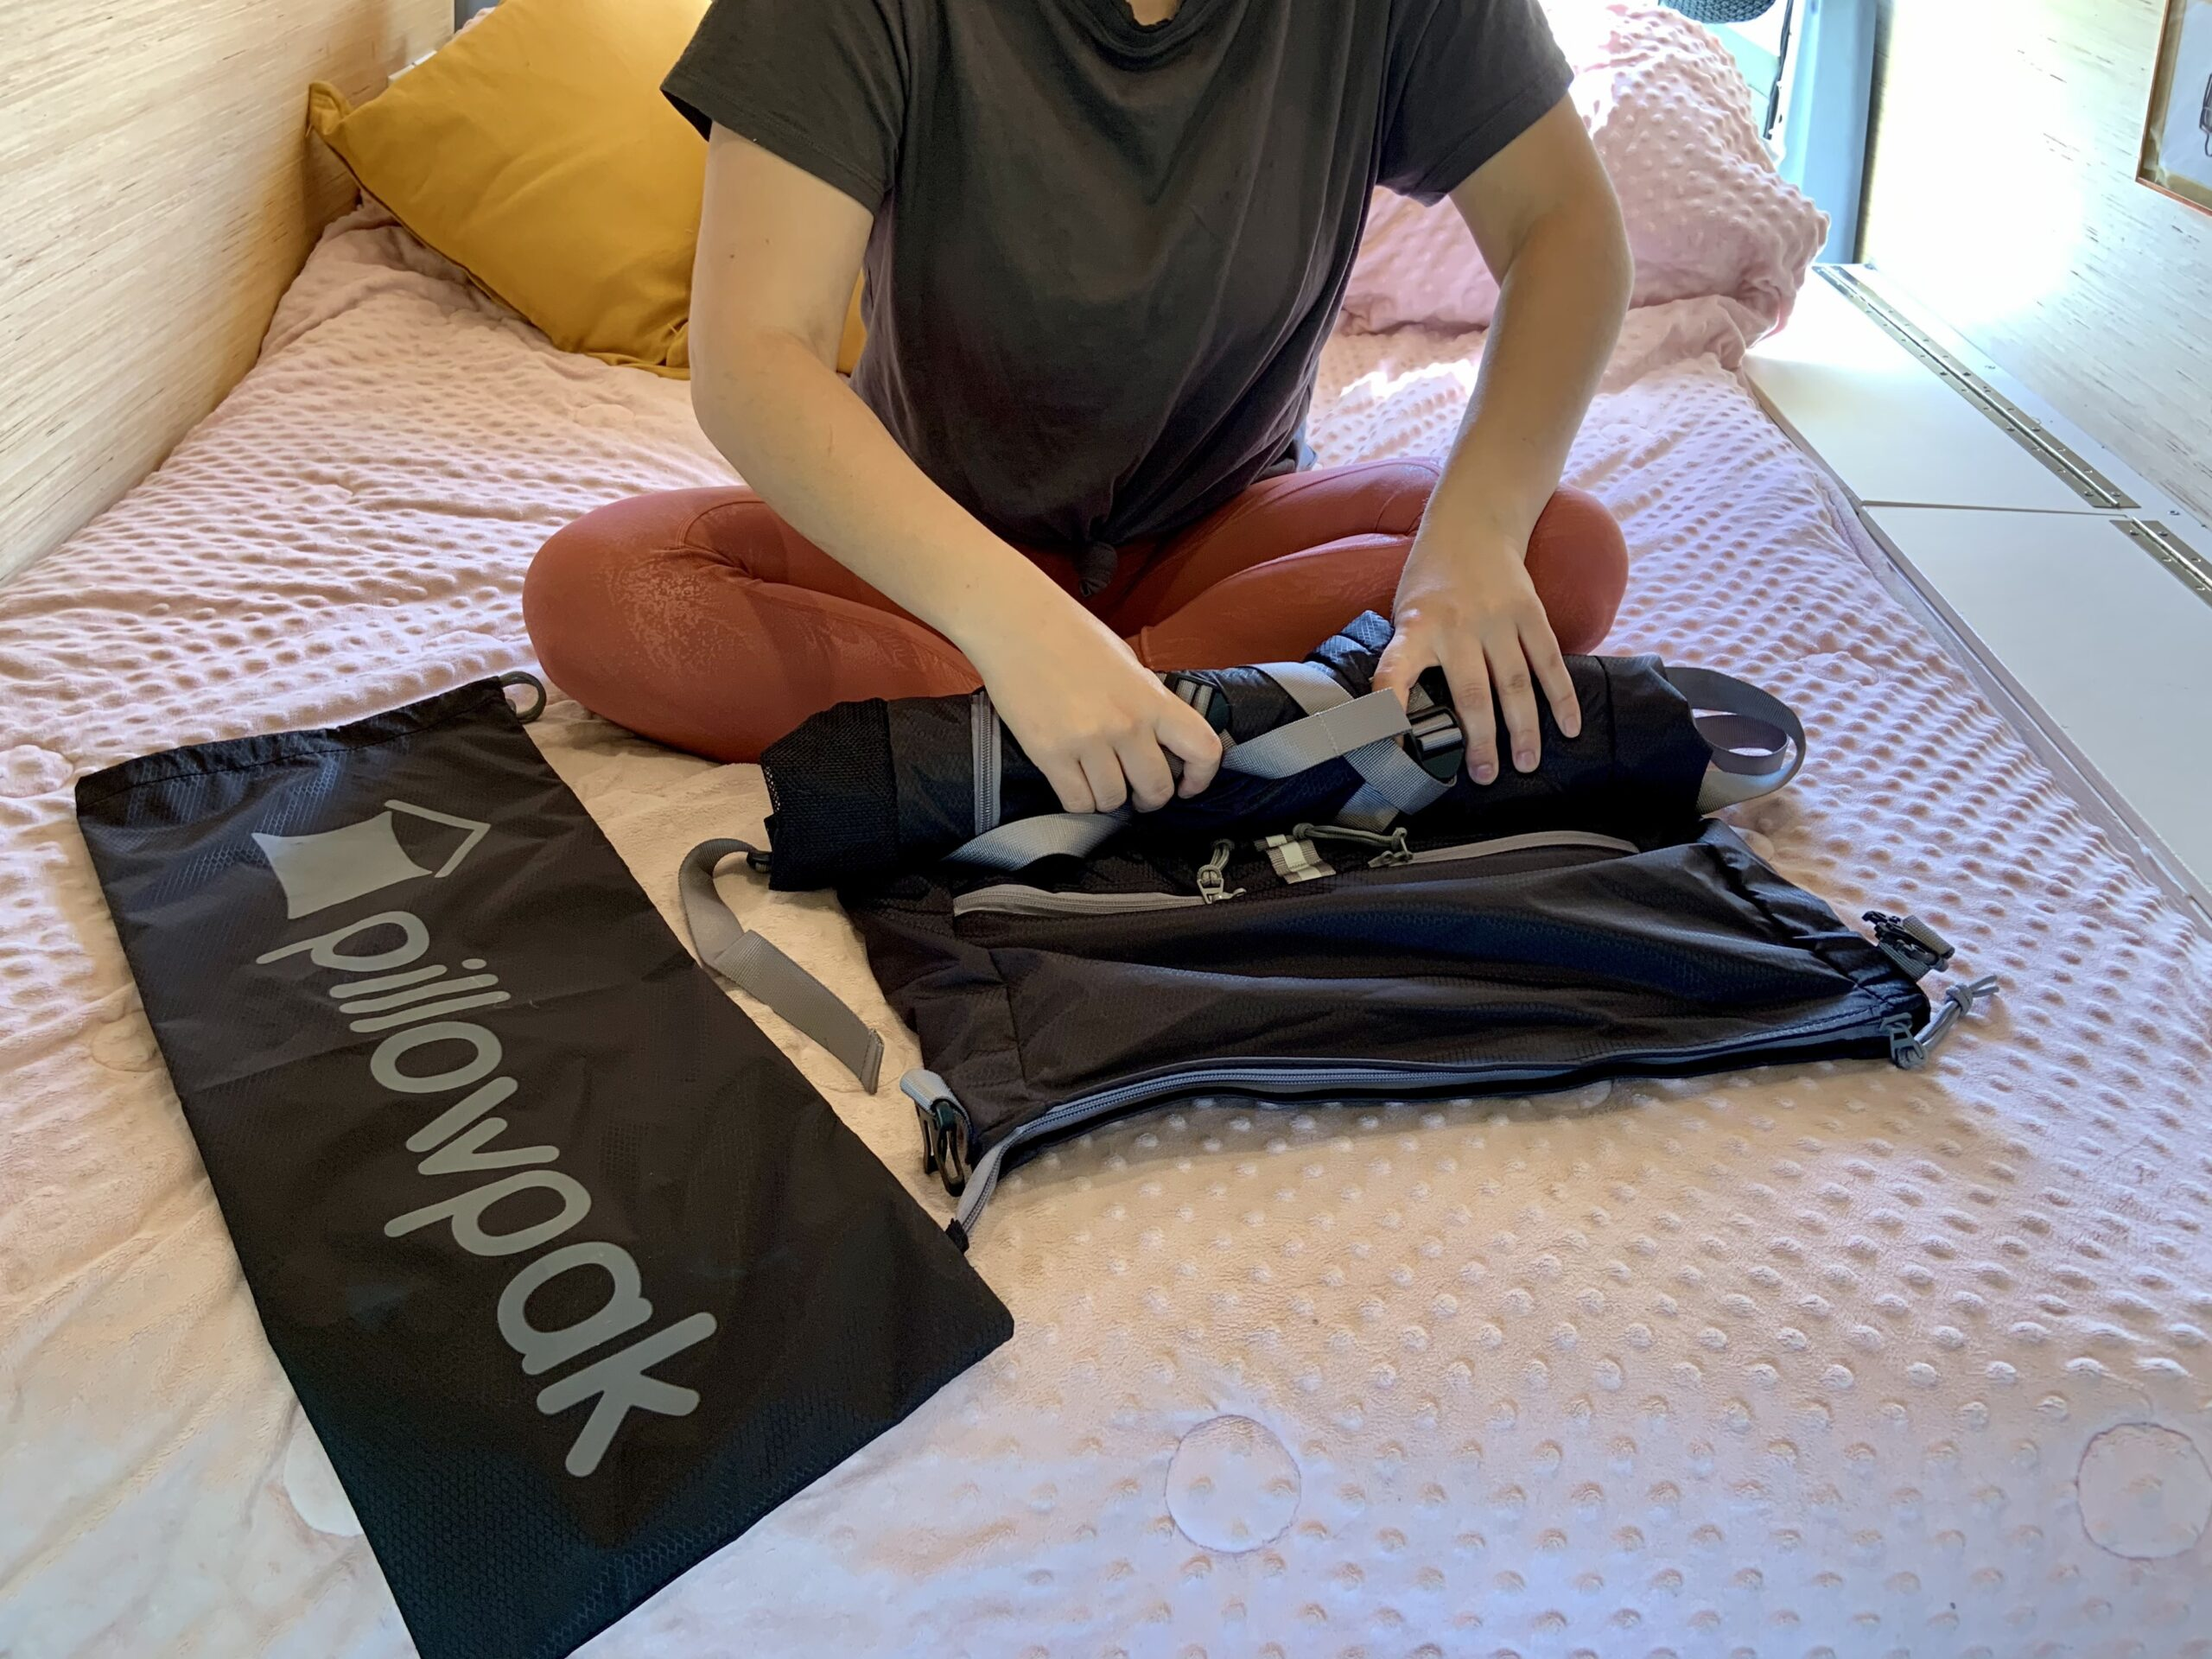 Pillowpak being stored